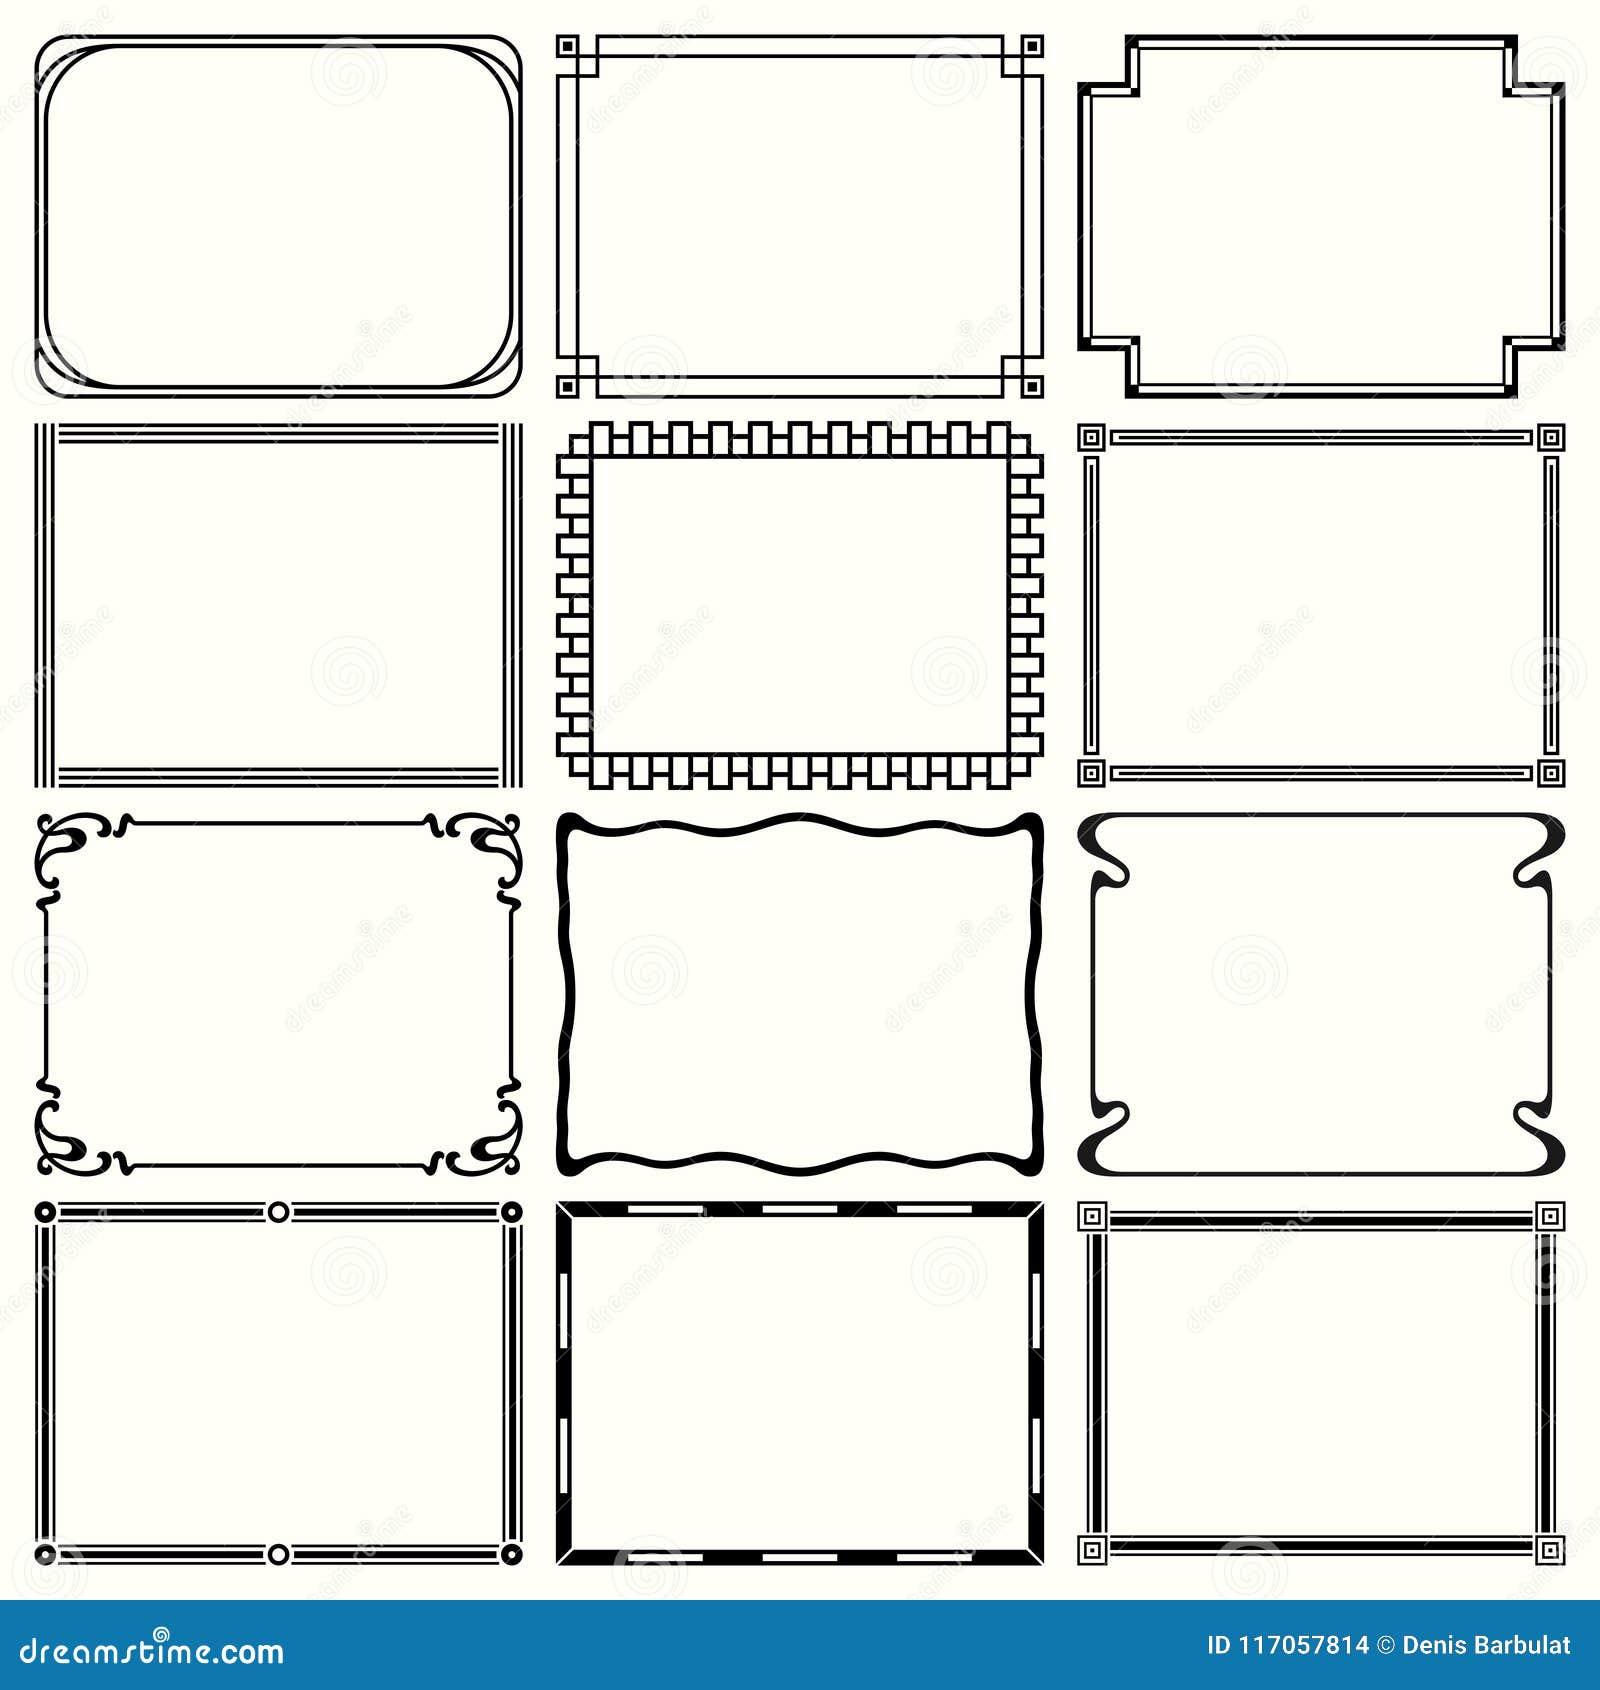 Decorative simple frames stock vector. Illustration of frame - 117057814